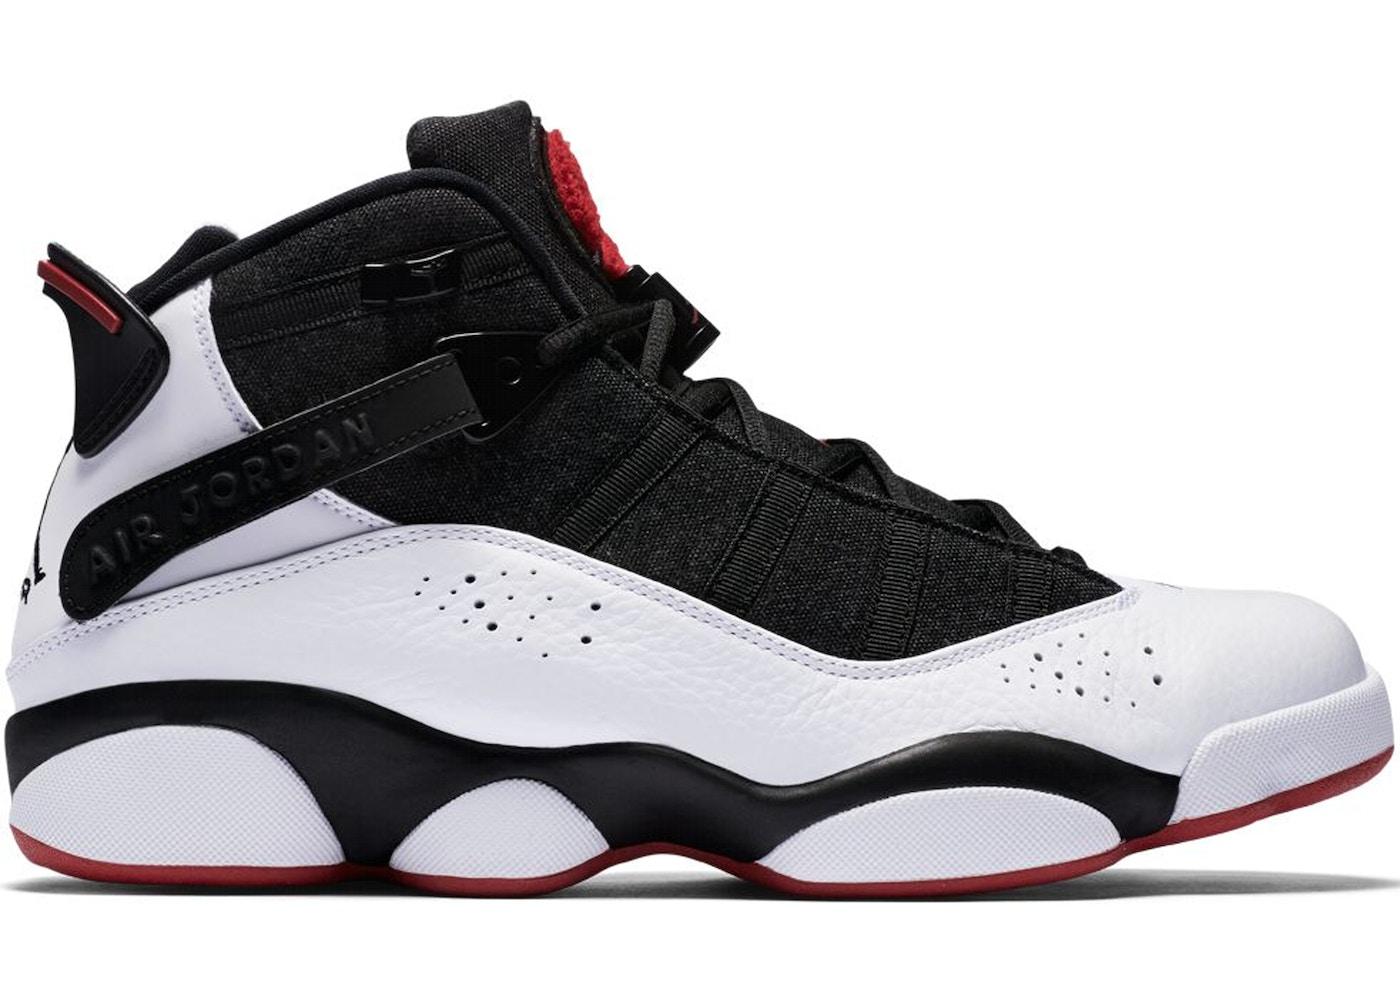 lowest price 1fc81 f1161 Jordan 6 Rings Black White Gym Red